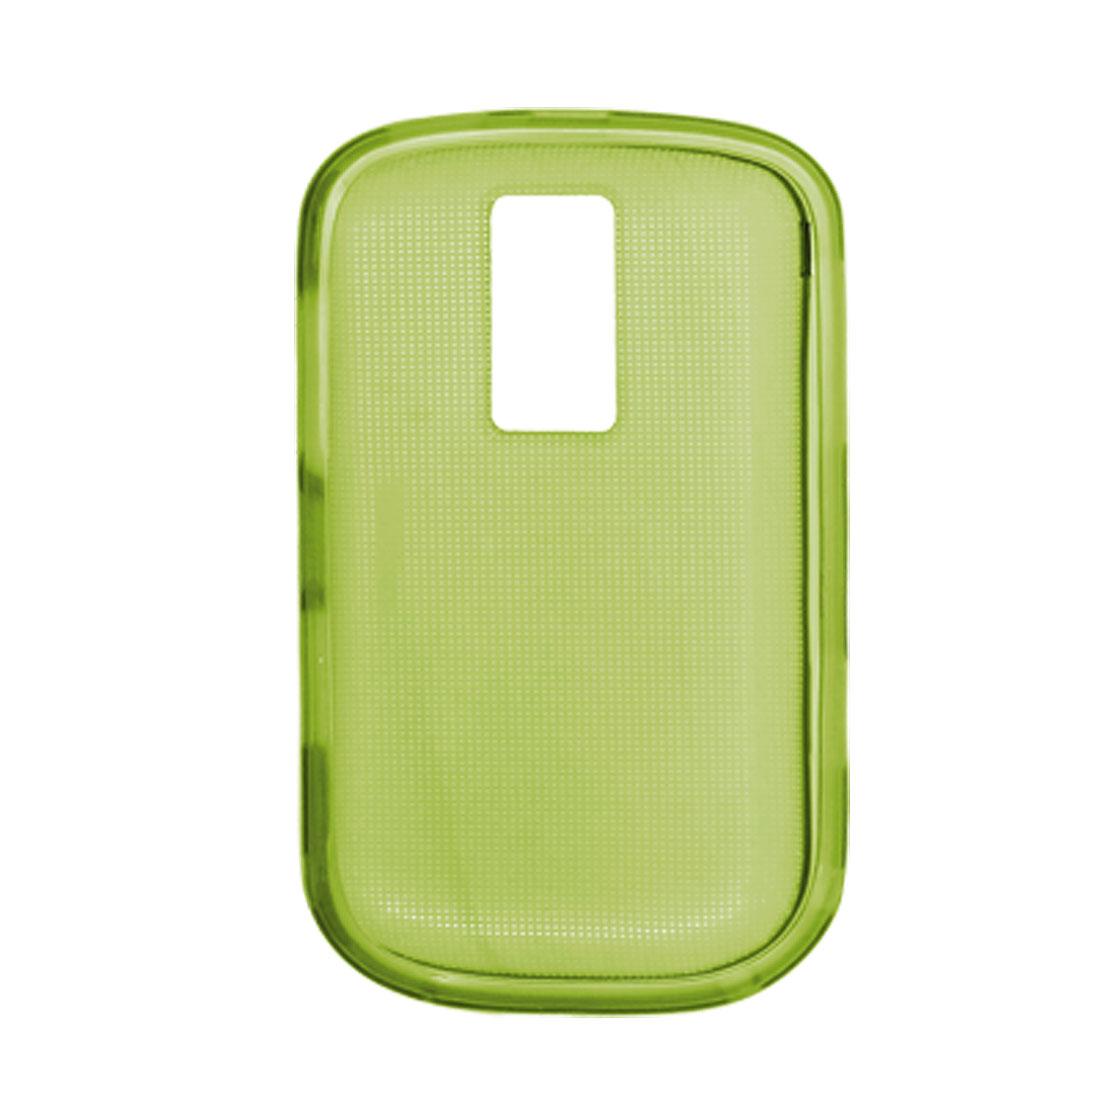 Soft Plastic Shield Cover Back Case for Blackberry 9000 Green